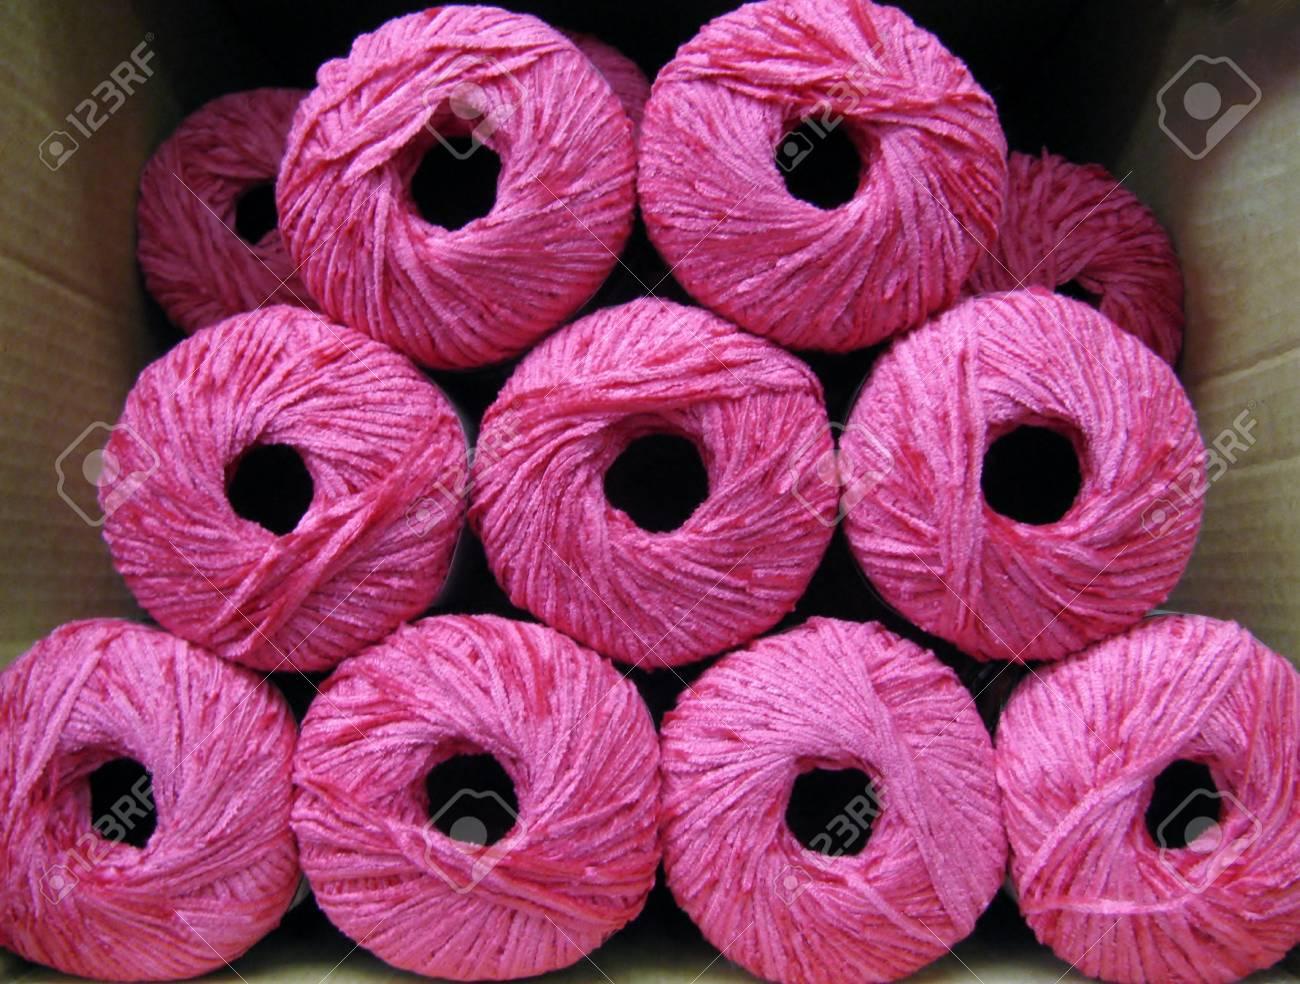 Set of bright pink rayon chenille yarn balls in a carton box